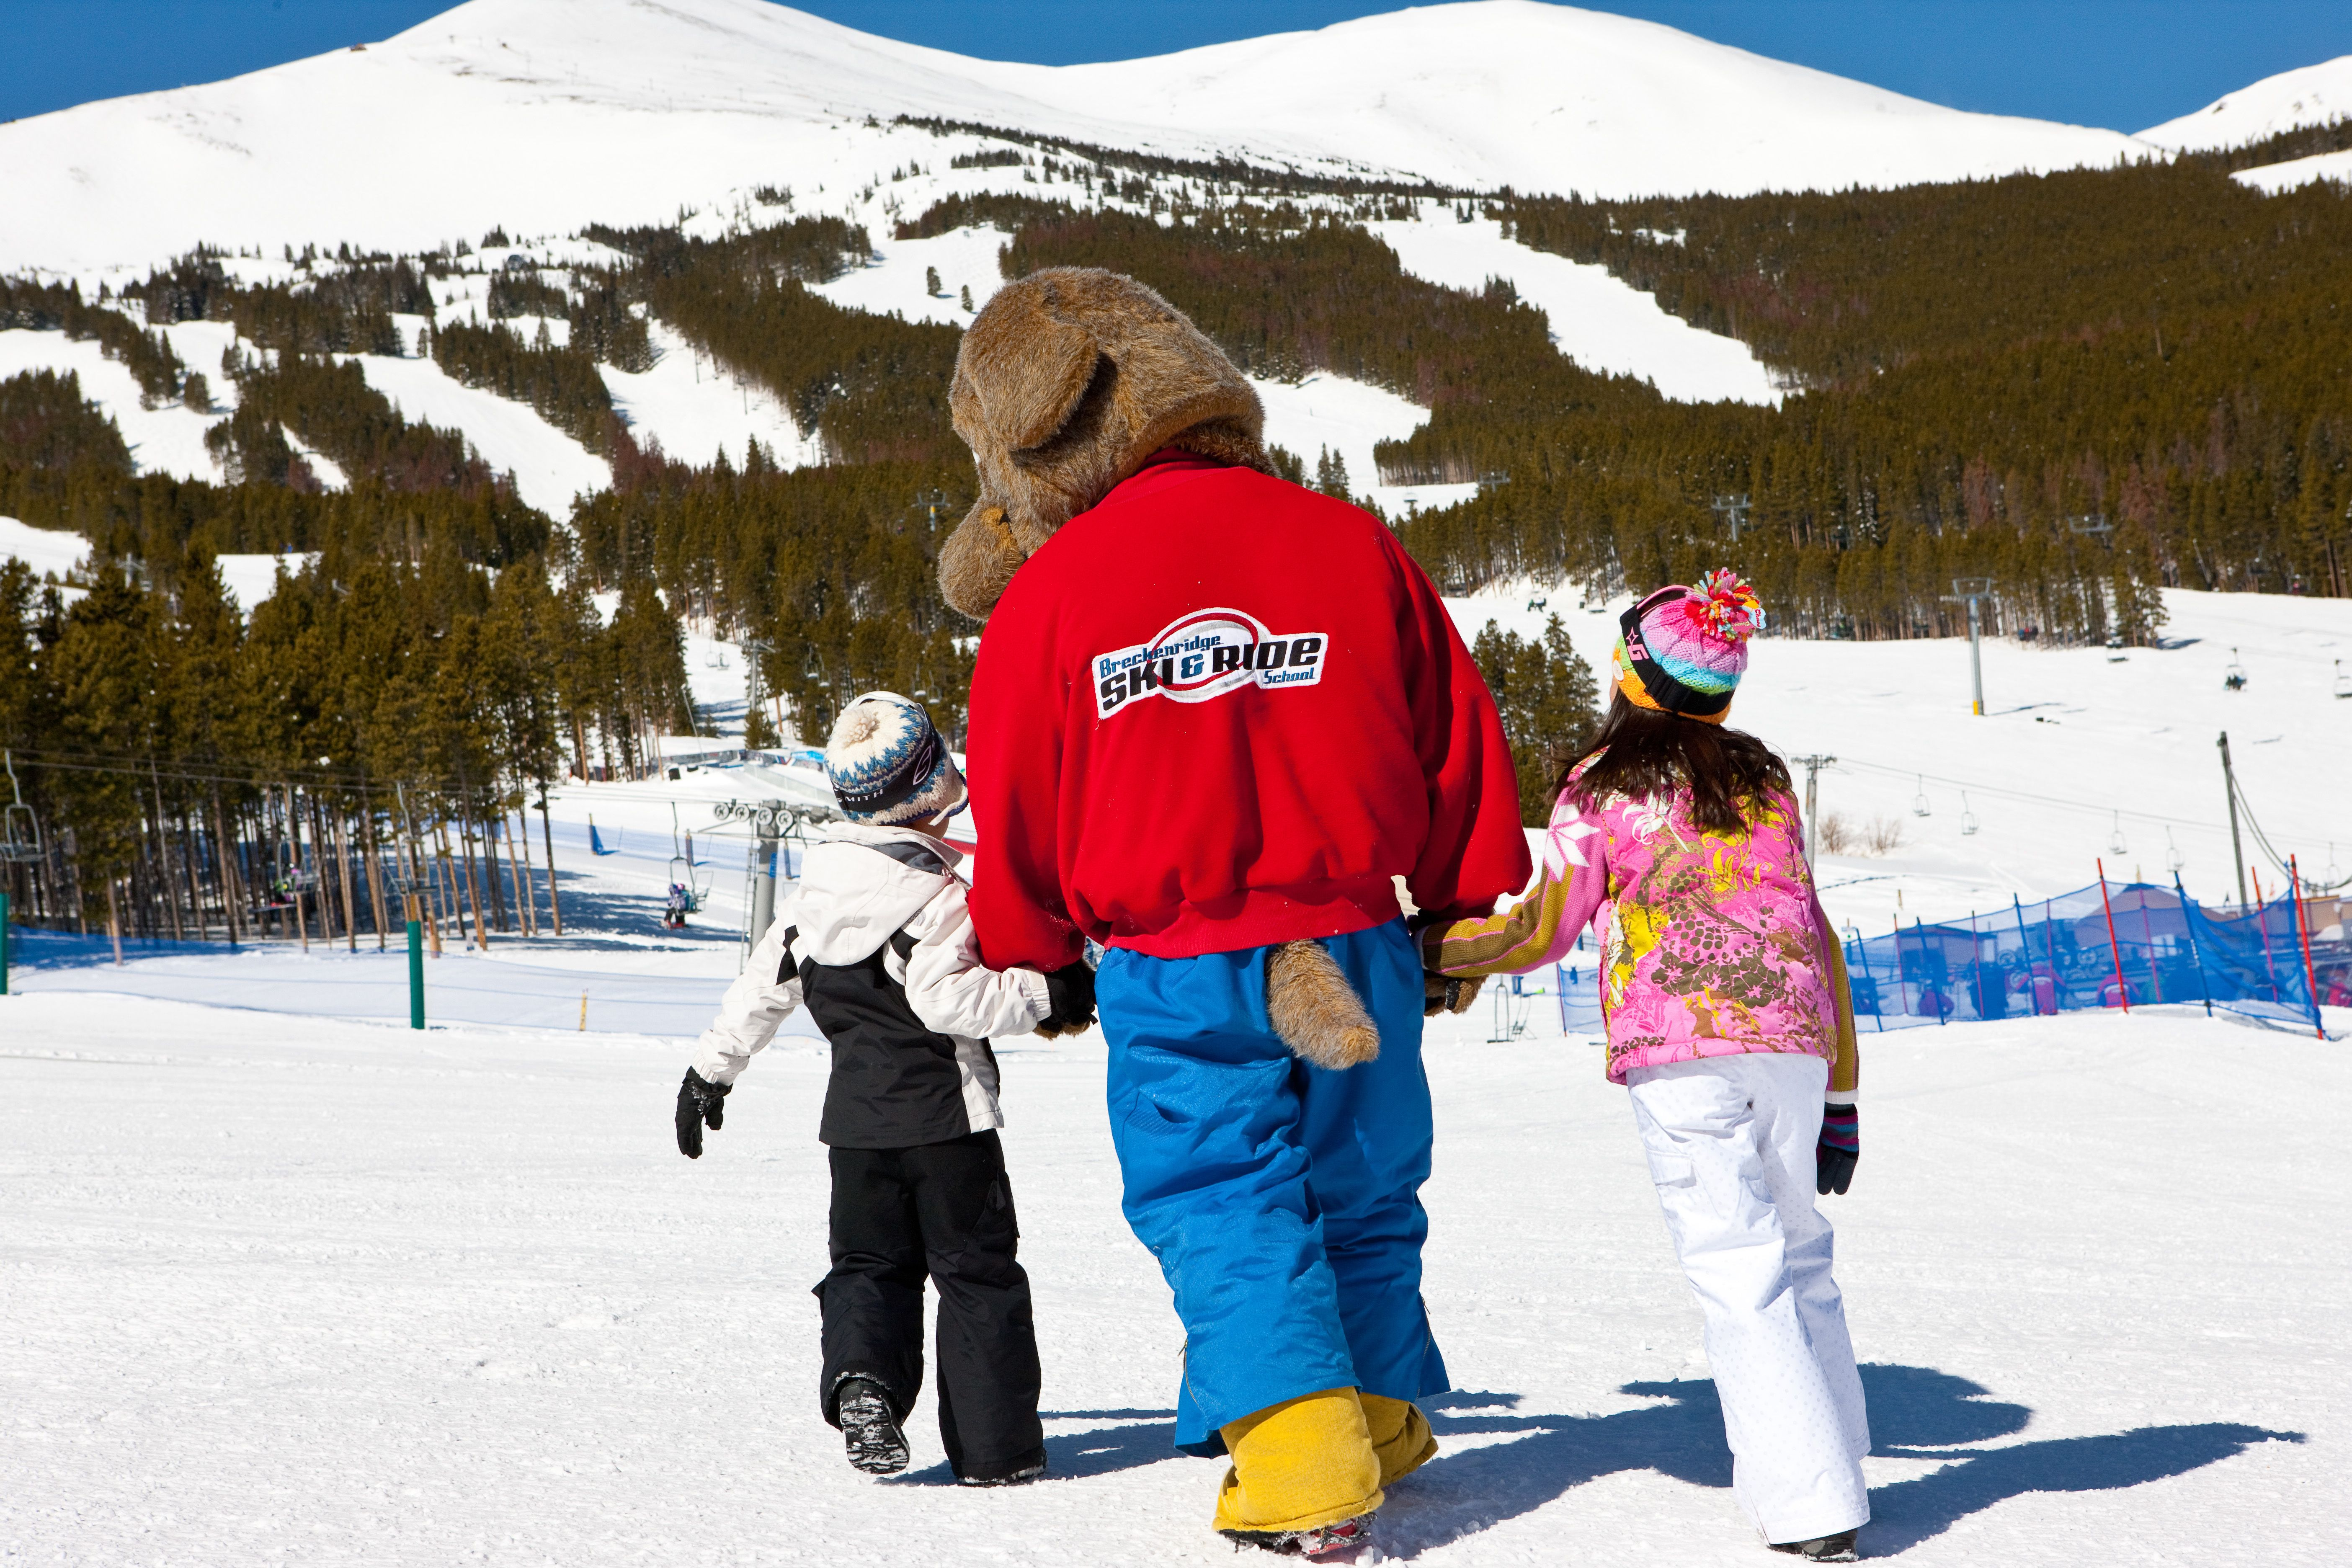 SkiGeilo | SkiGeilo | Family friendly alpine vacations